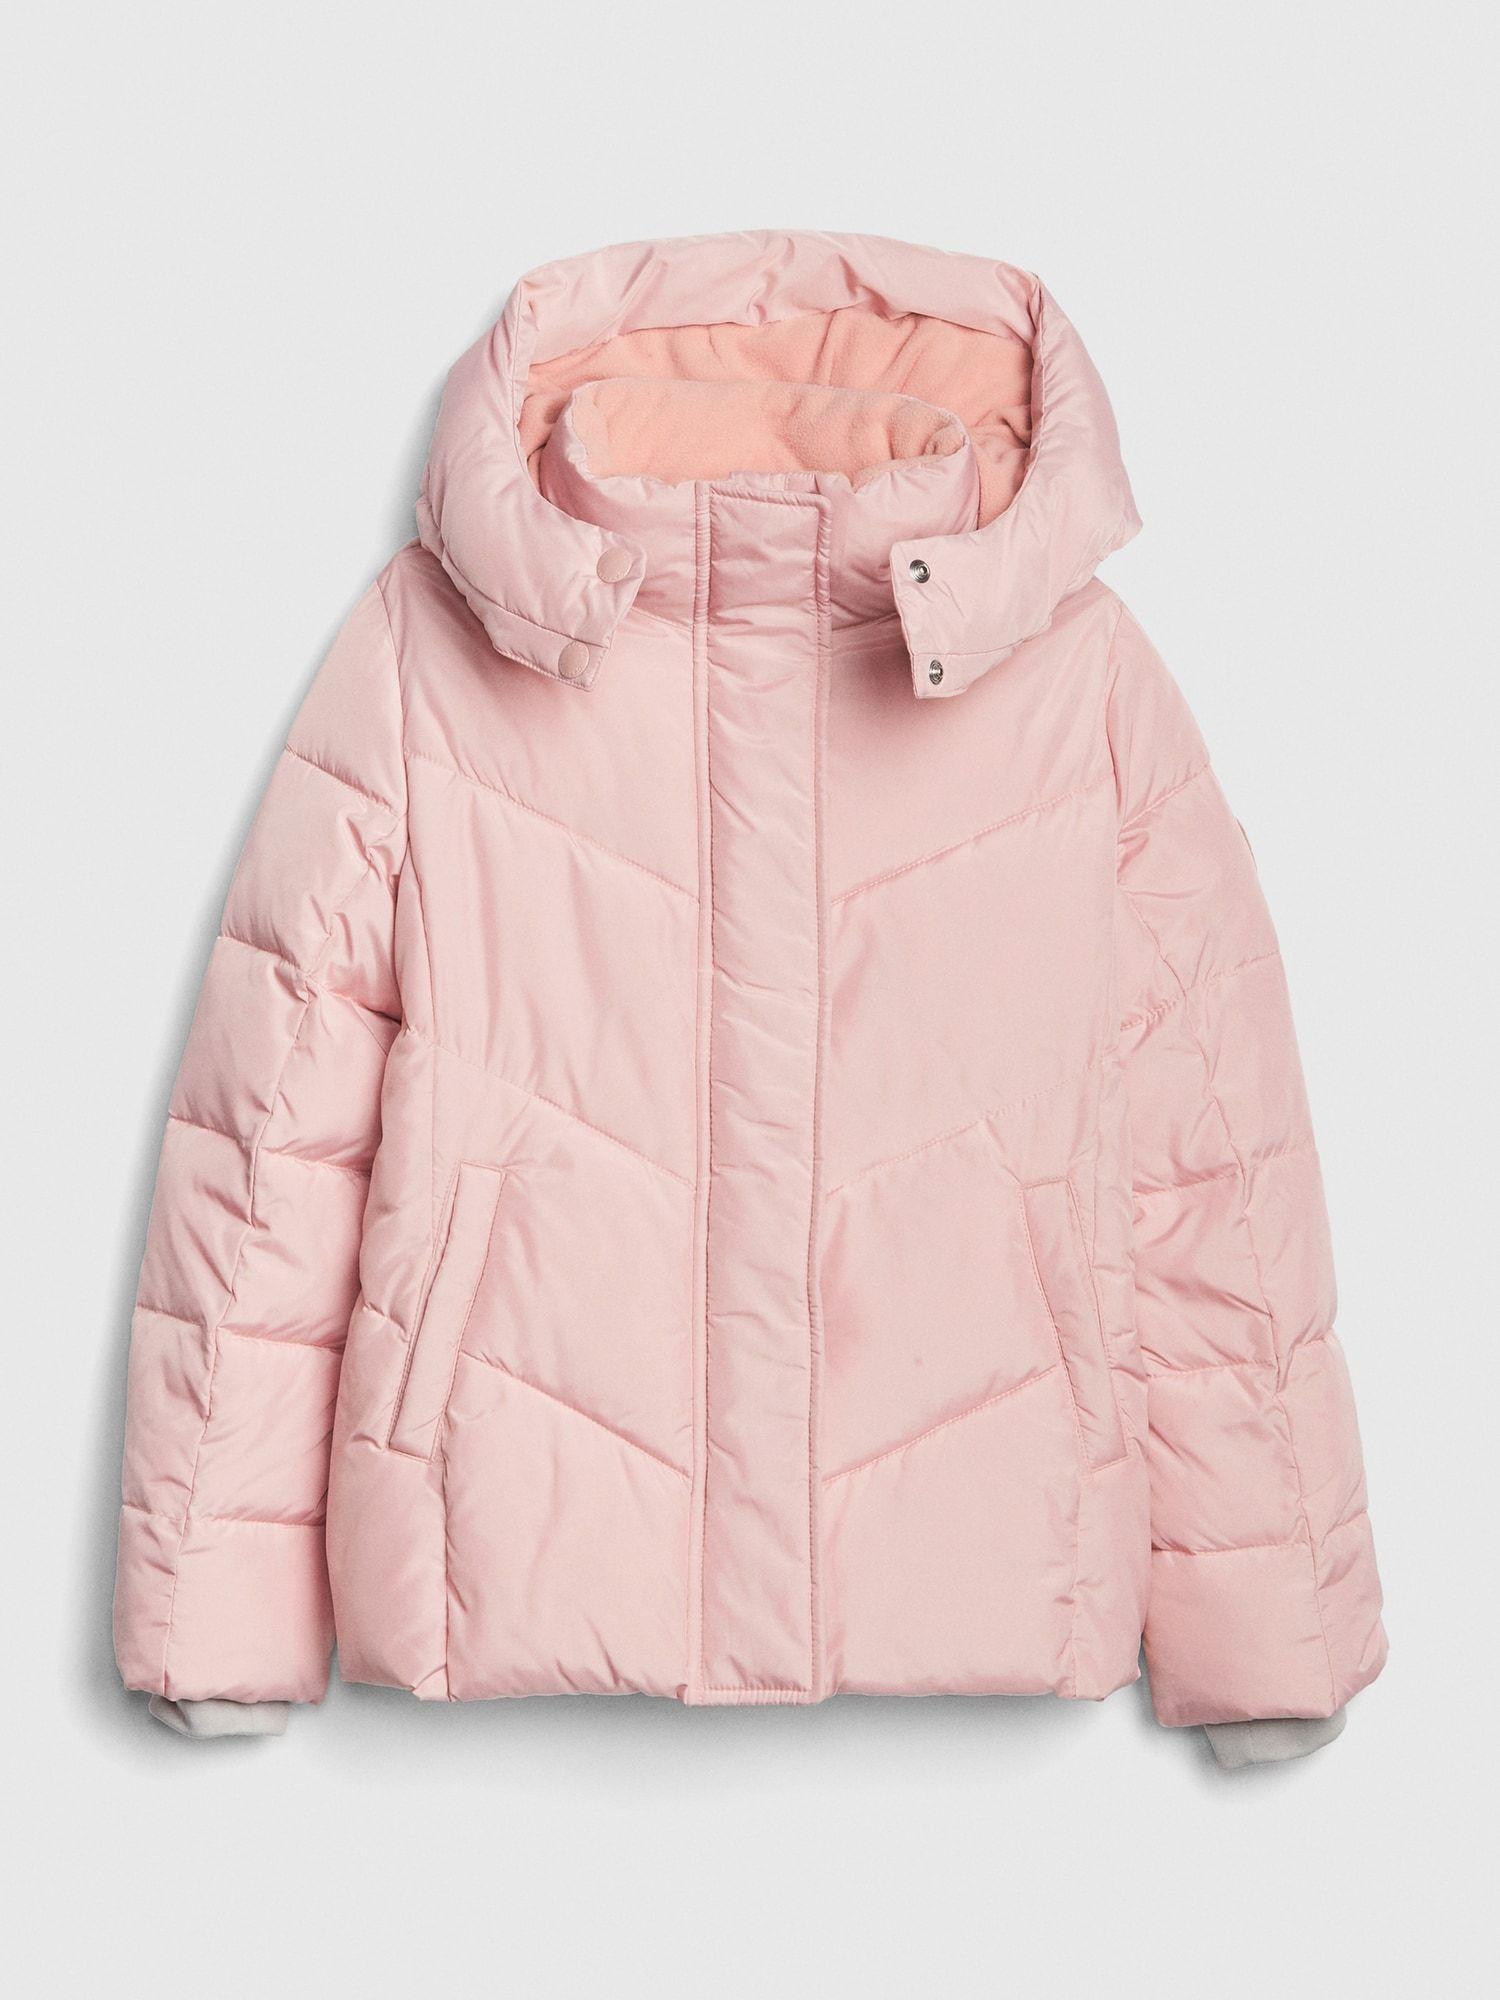 Kids Coldcontrol Max Puffer Parka Gap Moto Jacket Style Puffer Parka Outerwear Jackets [ 2000 x 1500 Pixel ]